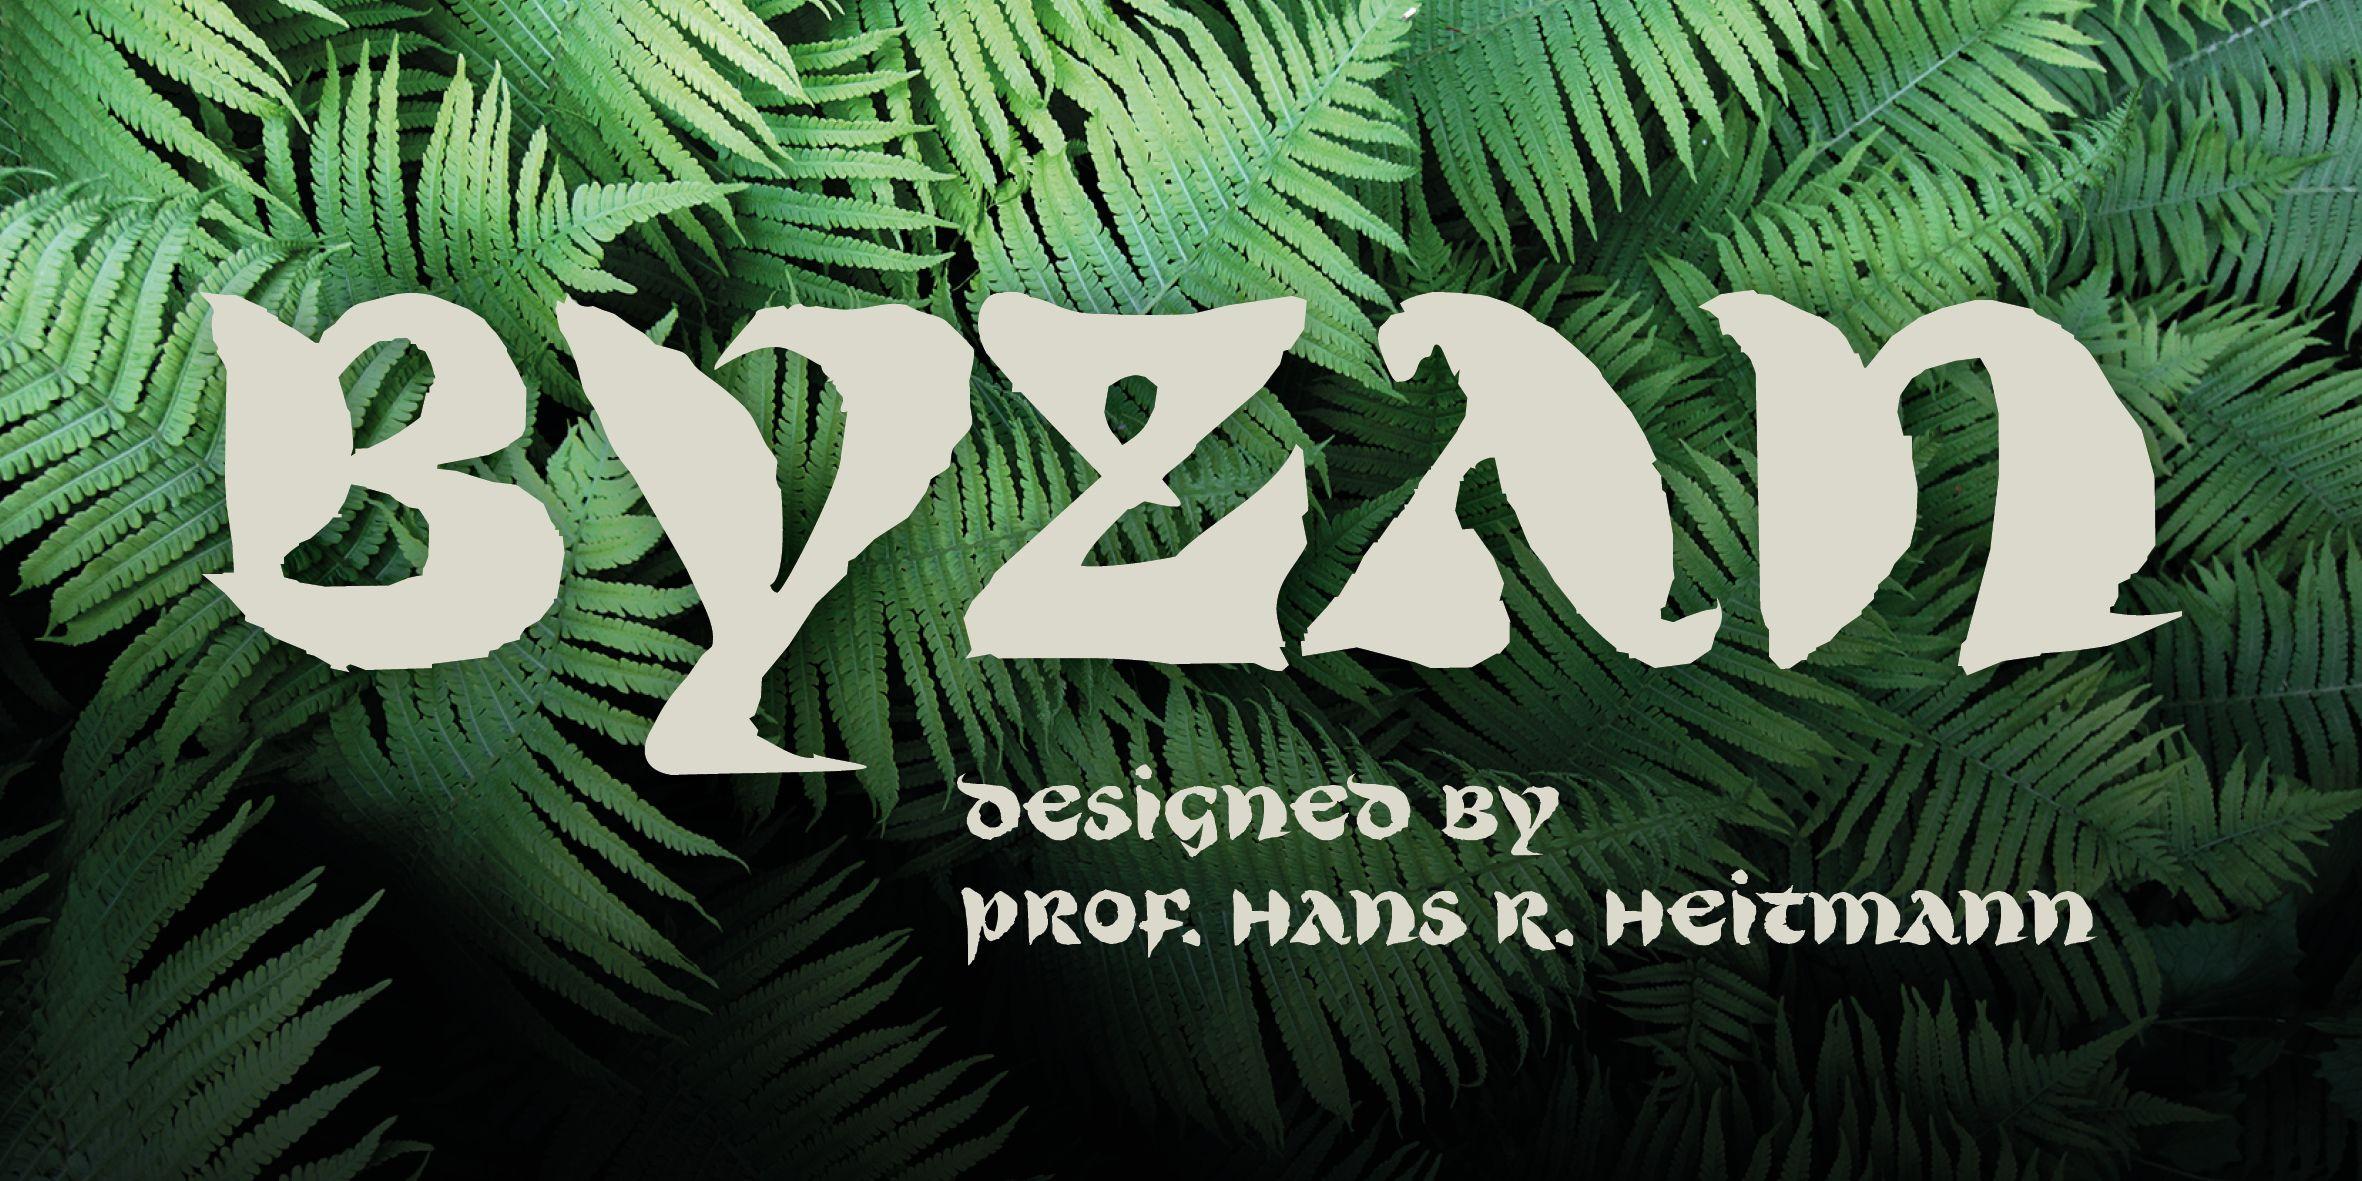 Poster: Byzan Font designed by prof. Hans R. Heitmann